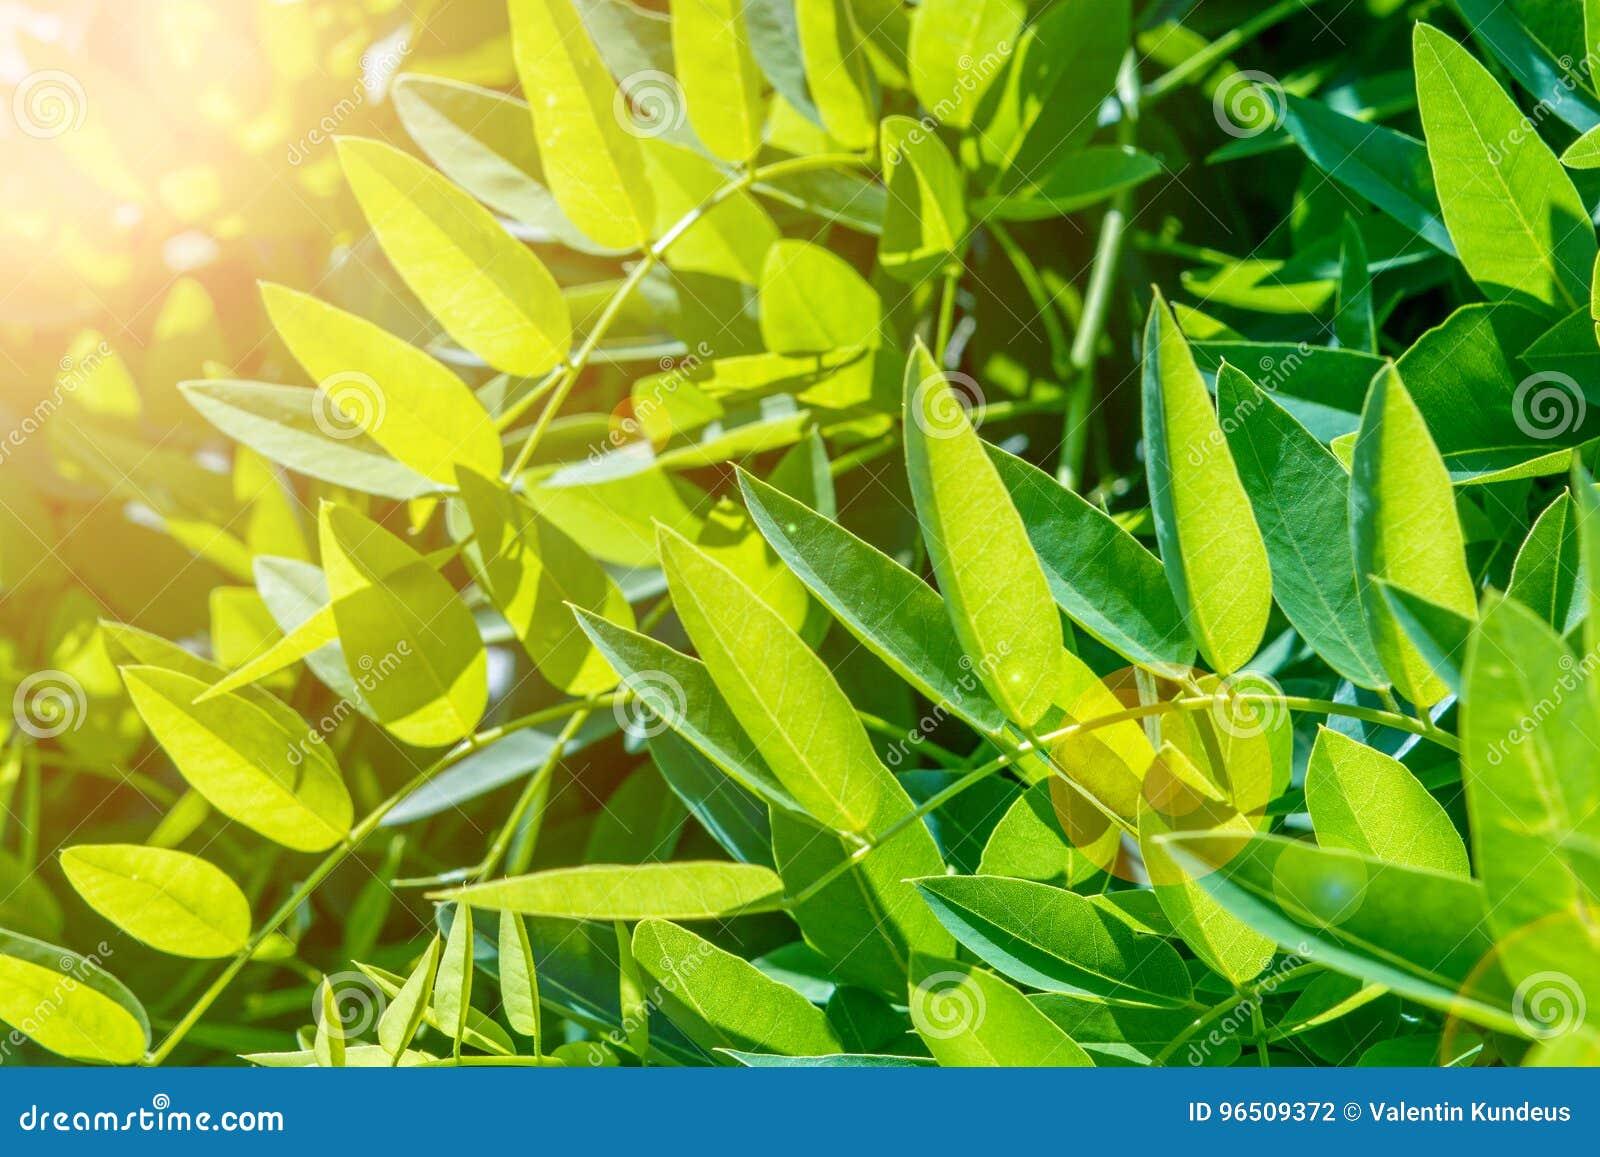 arbre de cognassier du japon de sophora lames d'arbre acacia fond